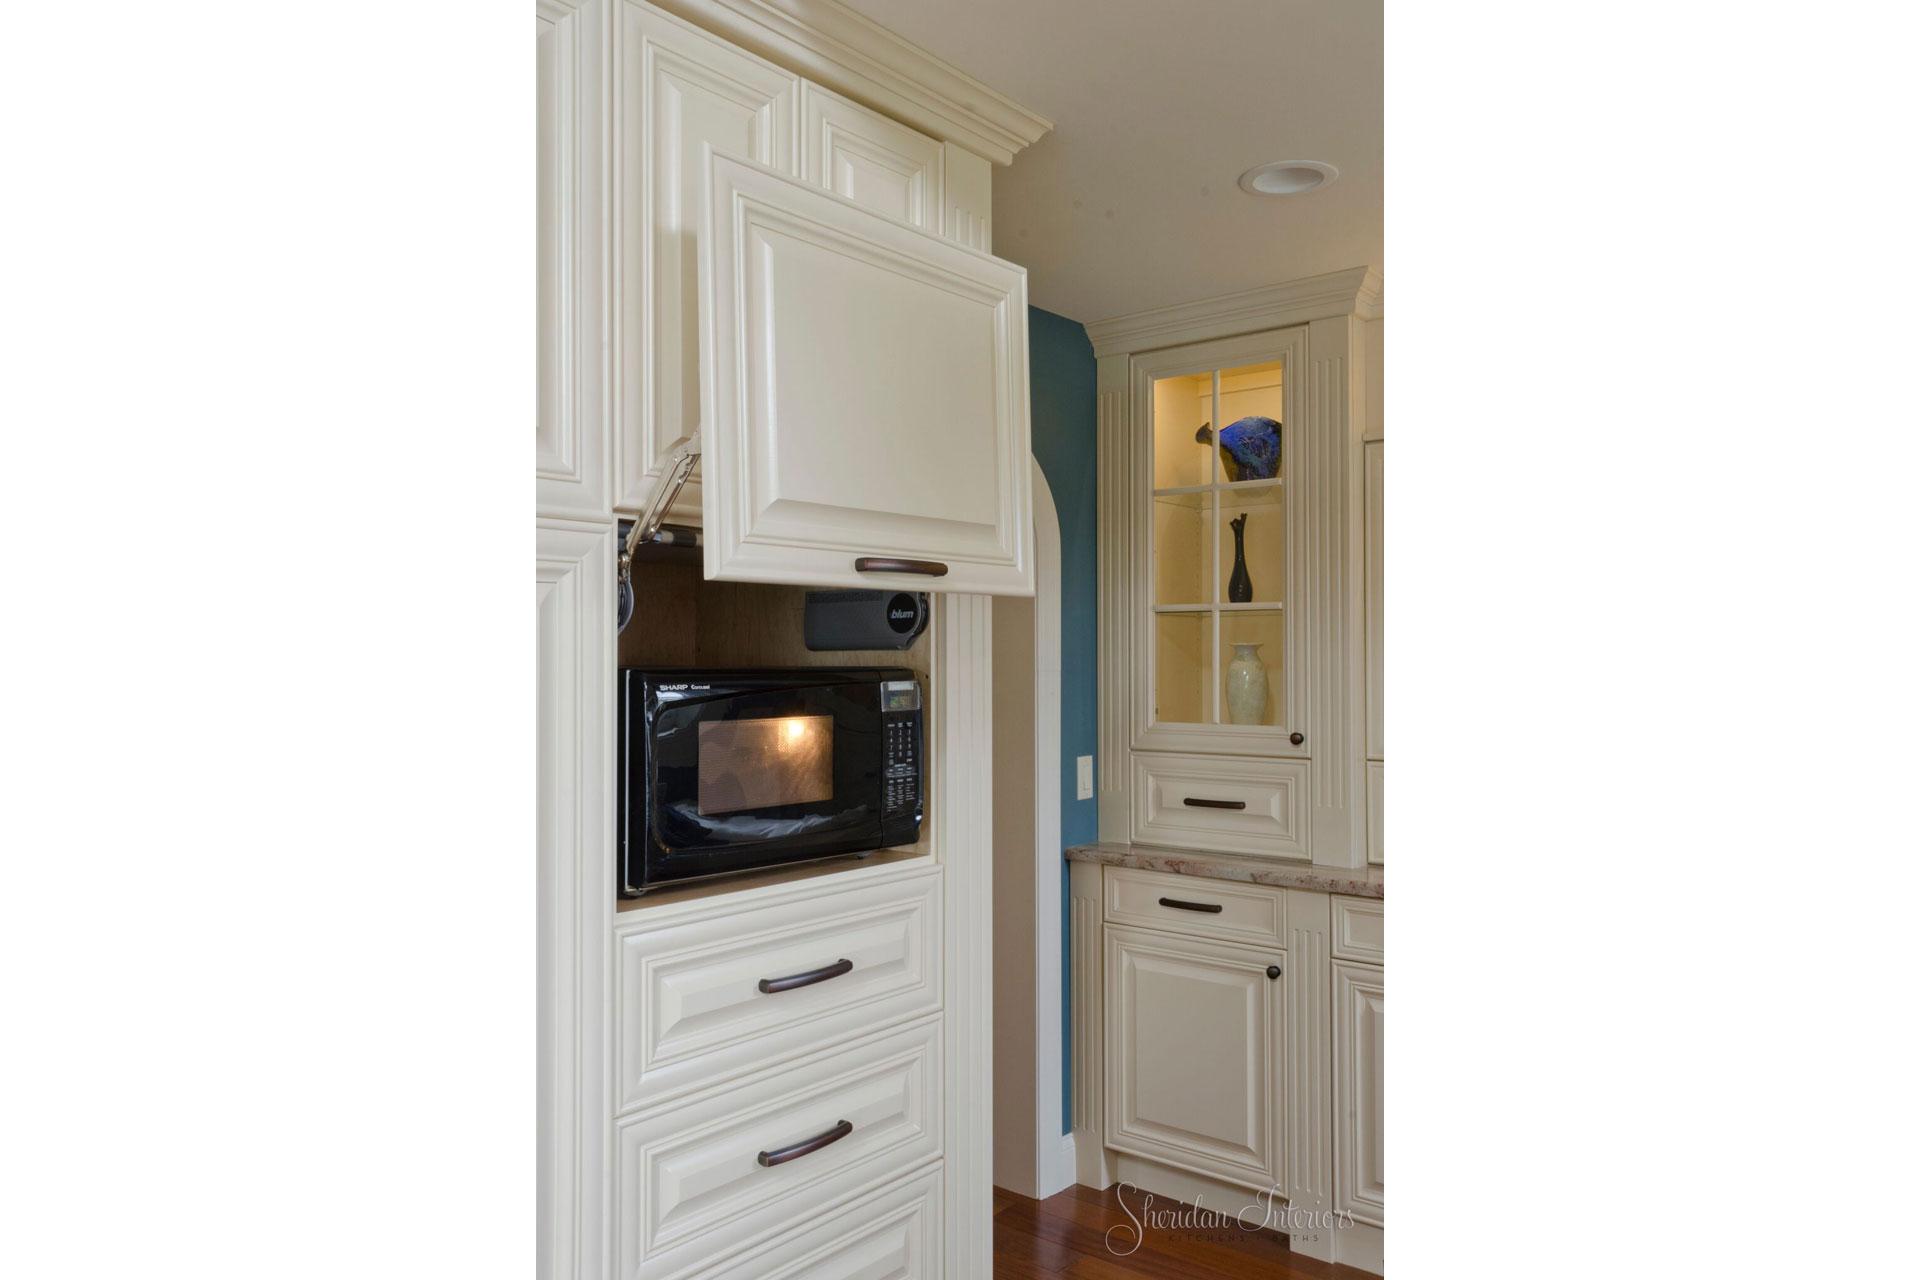 traditional kitchen, white kitchen, microwave behind lift up door, Butler's Pantry - Sheridan Interiors, sheridan interiors kitchens and baths, kitchen designer cornwall, kitchen designer ottawa